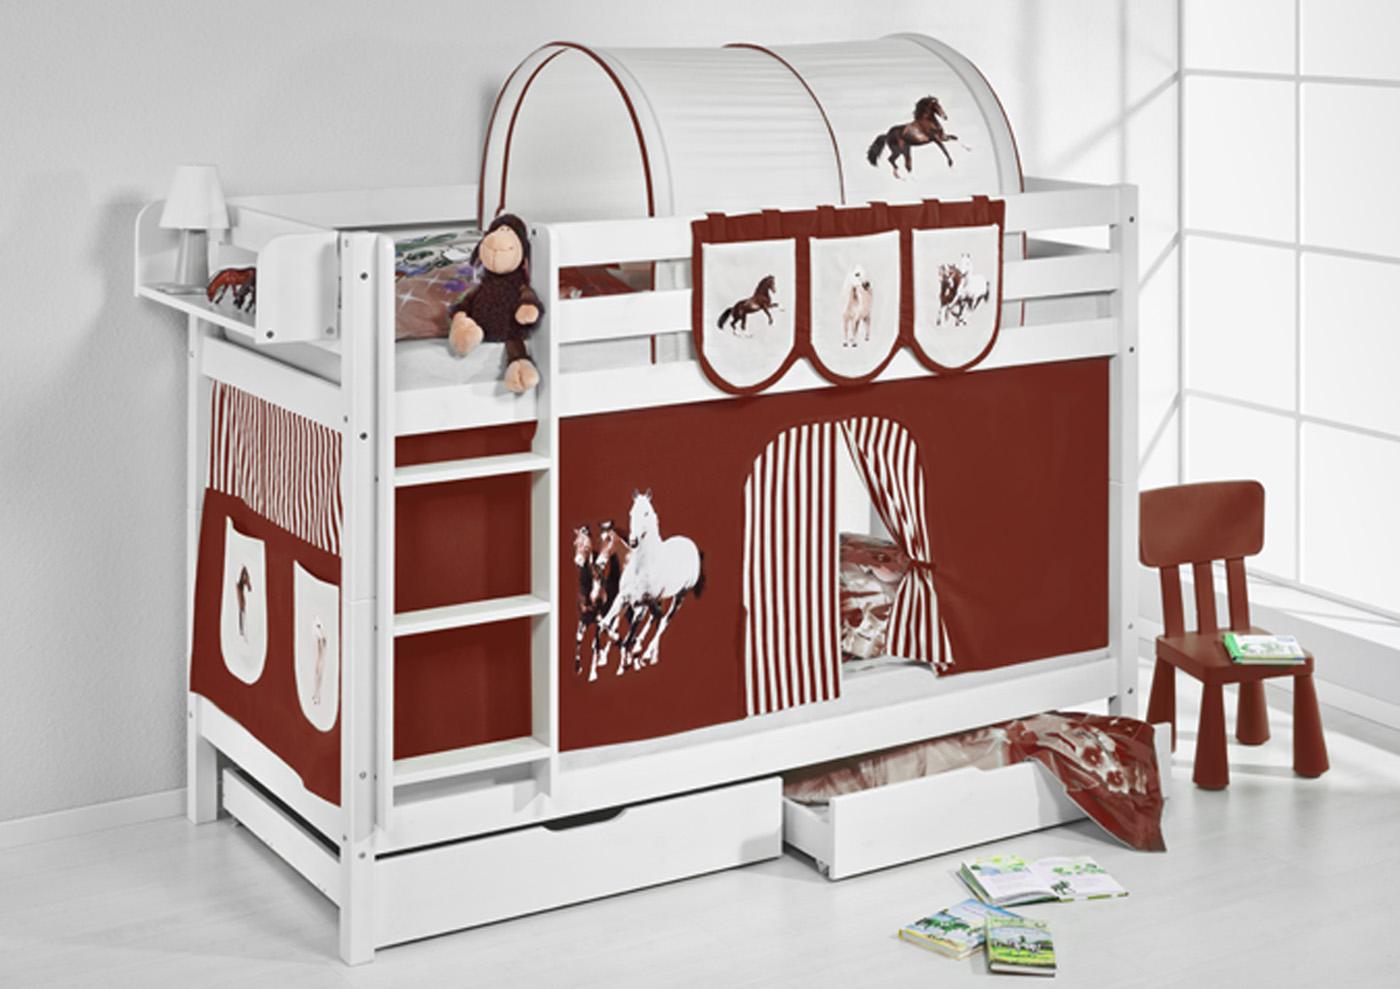 Etagenbett Kinder Spielbett : Tau abenteuer bett doppelstockbett hochbett spielbett rutsche in